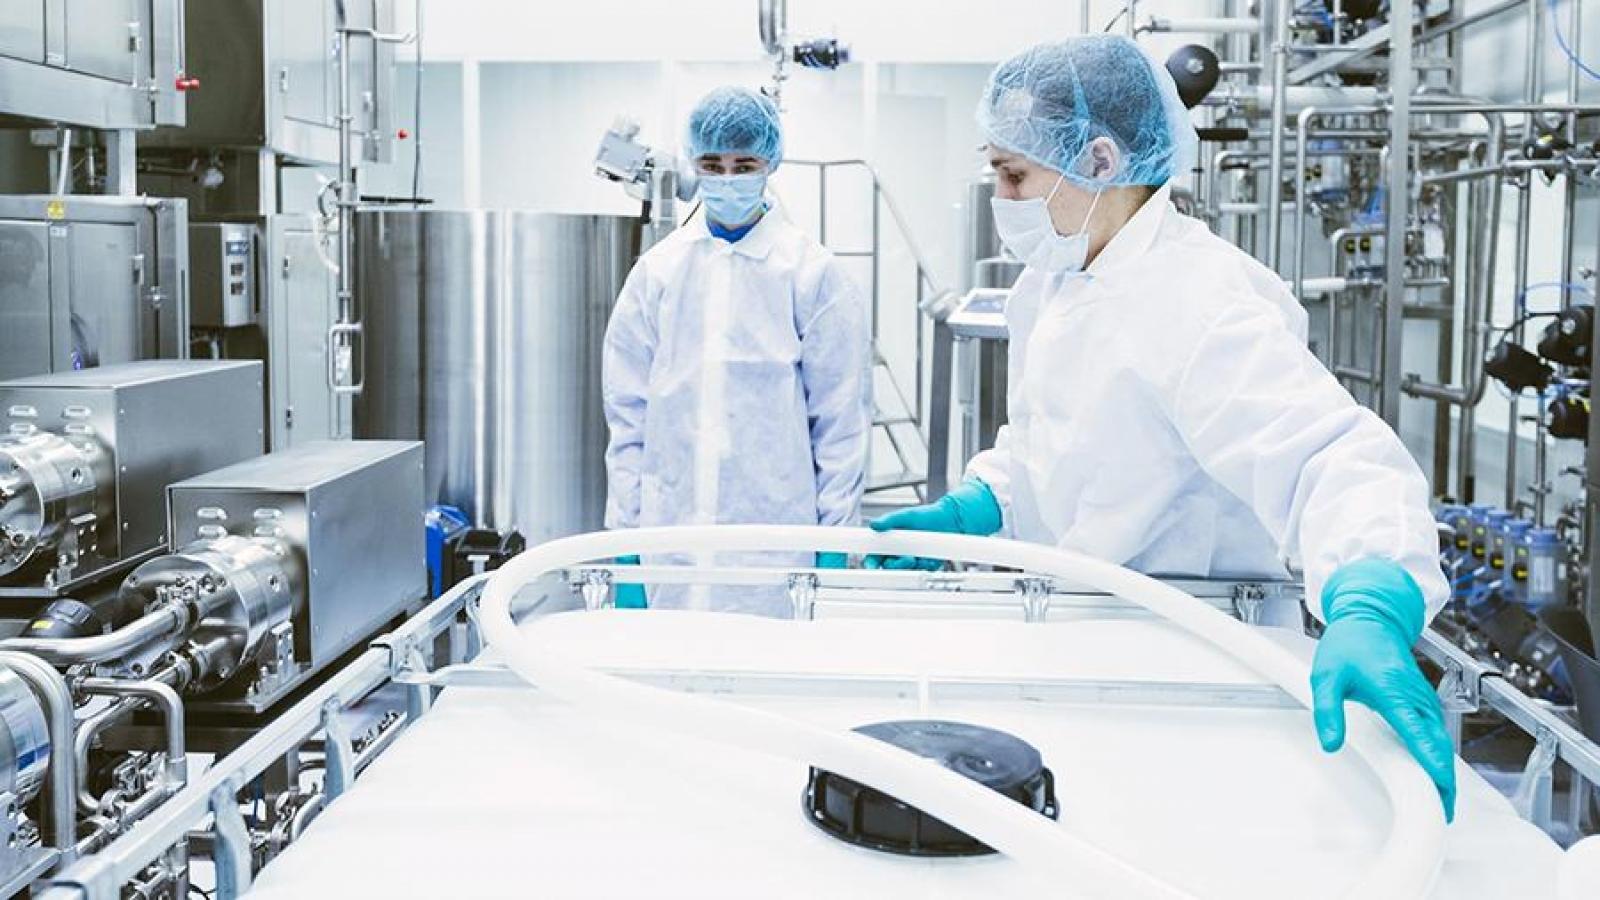 Nga sẽ có một số loại vaccine ngừa Covid-19